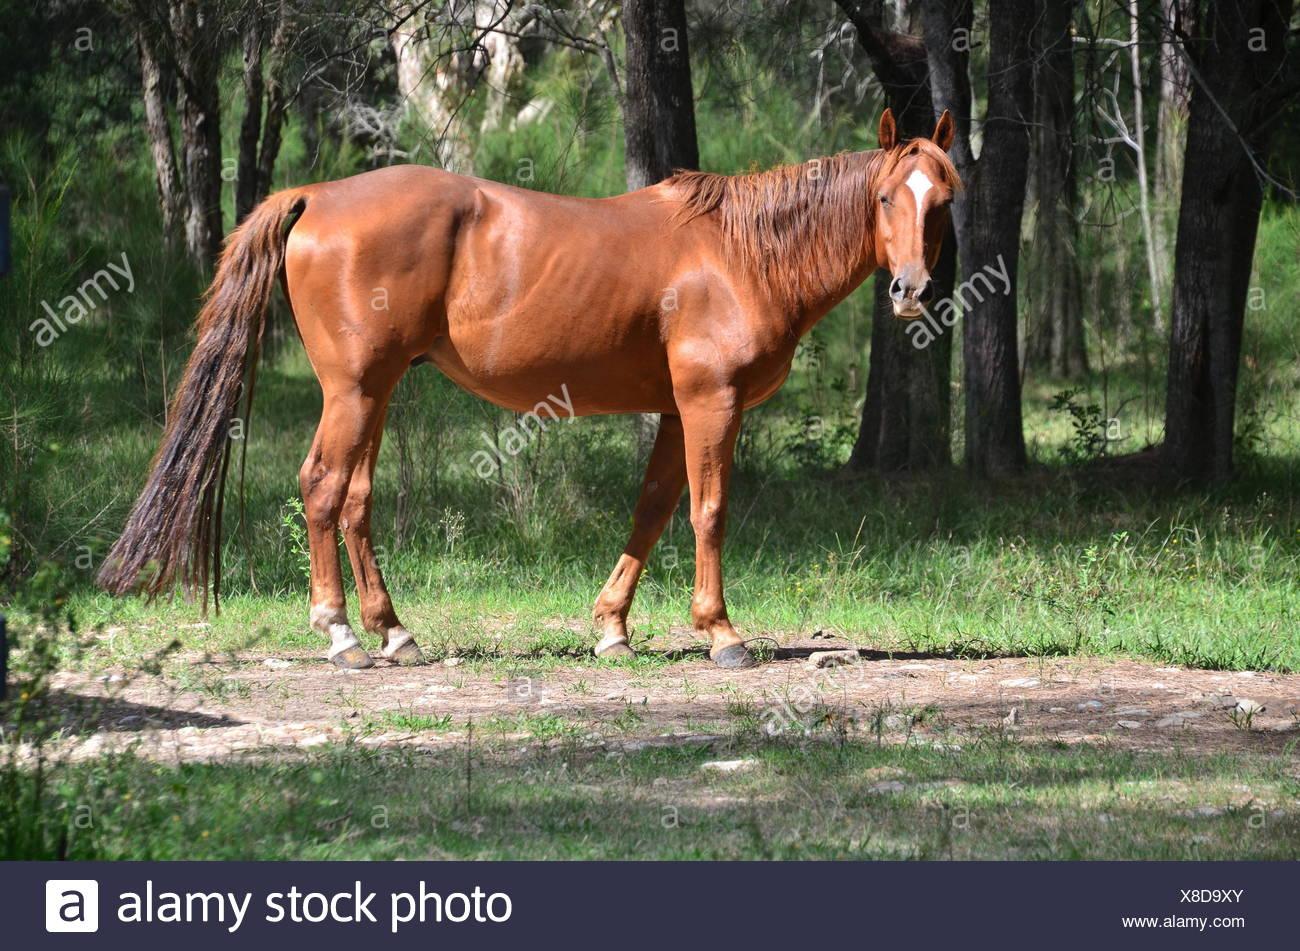 gelding riding - Stock Image